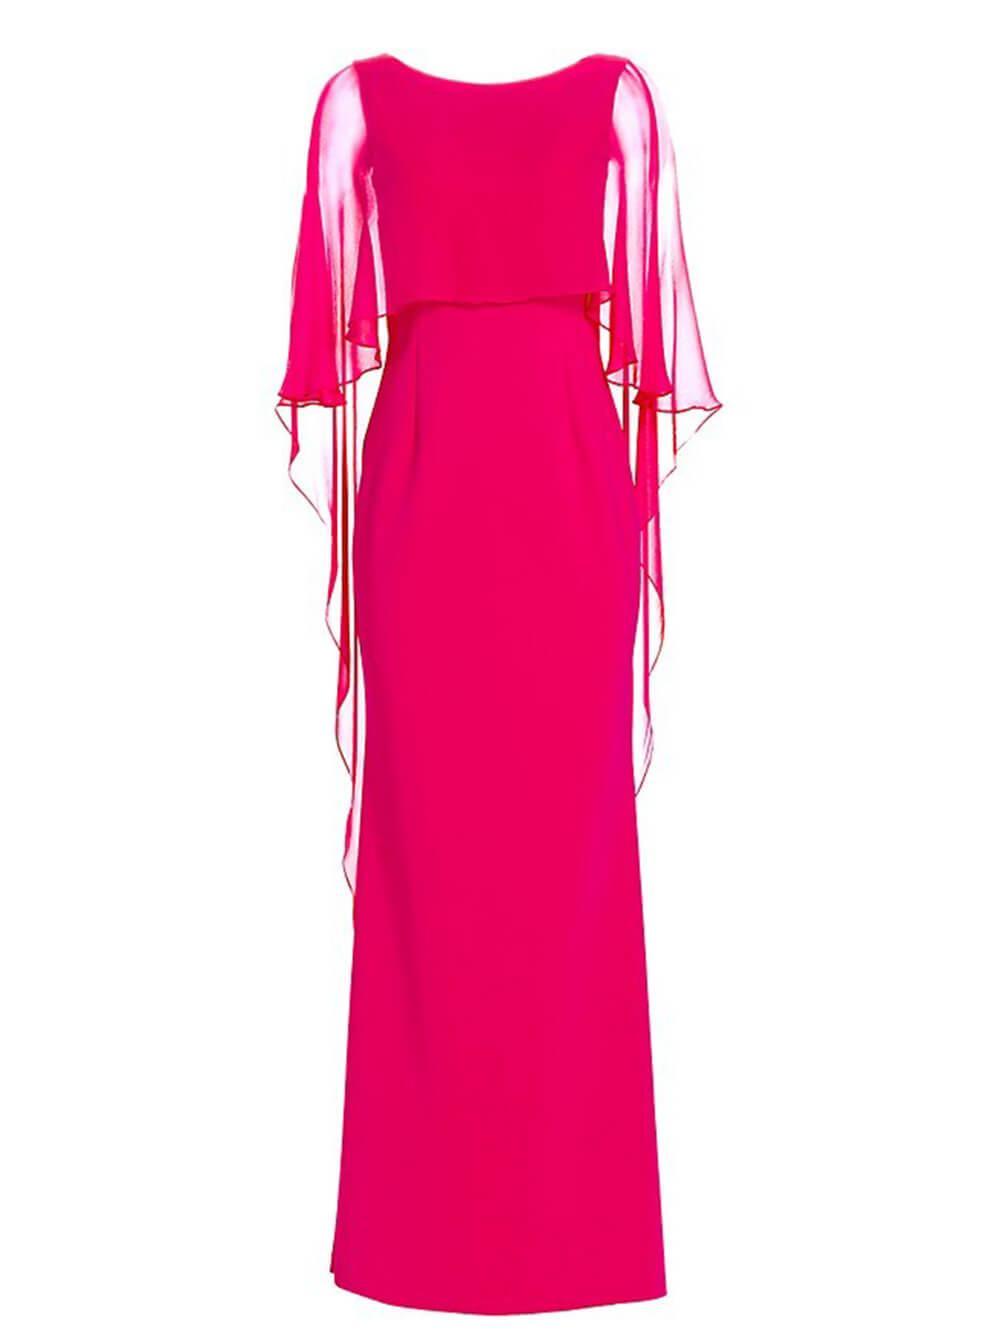 Scuba Dress With Chiffon Overlay